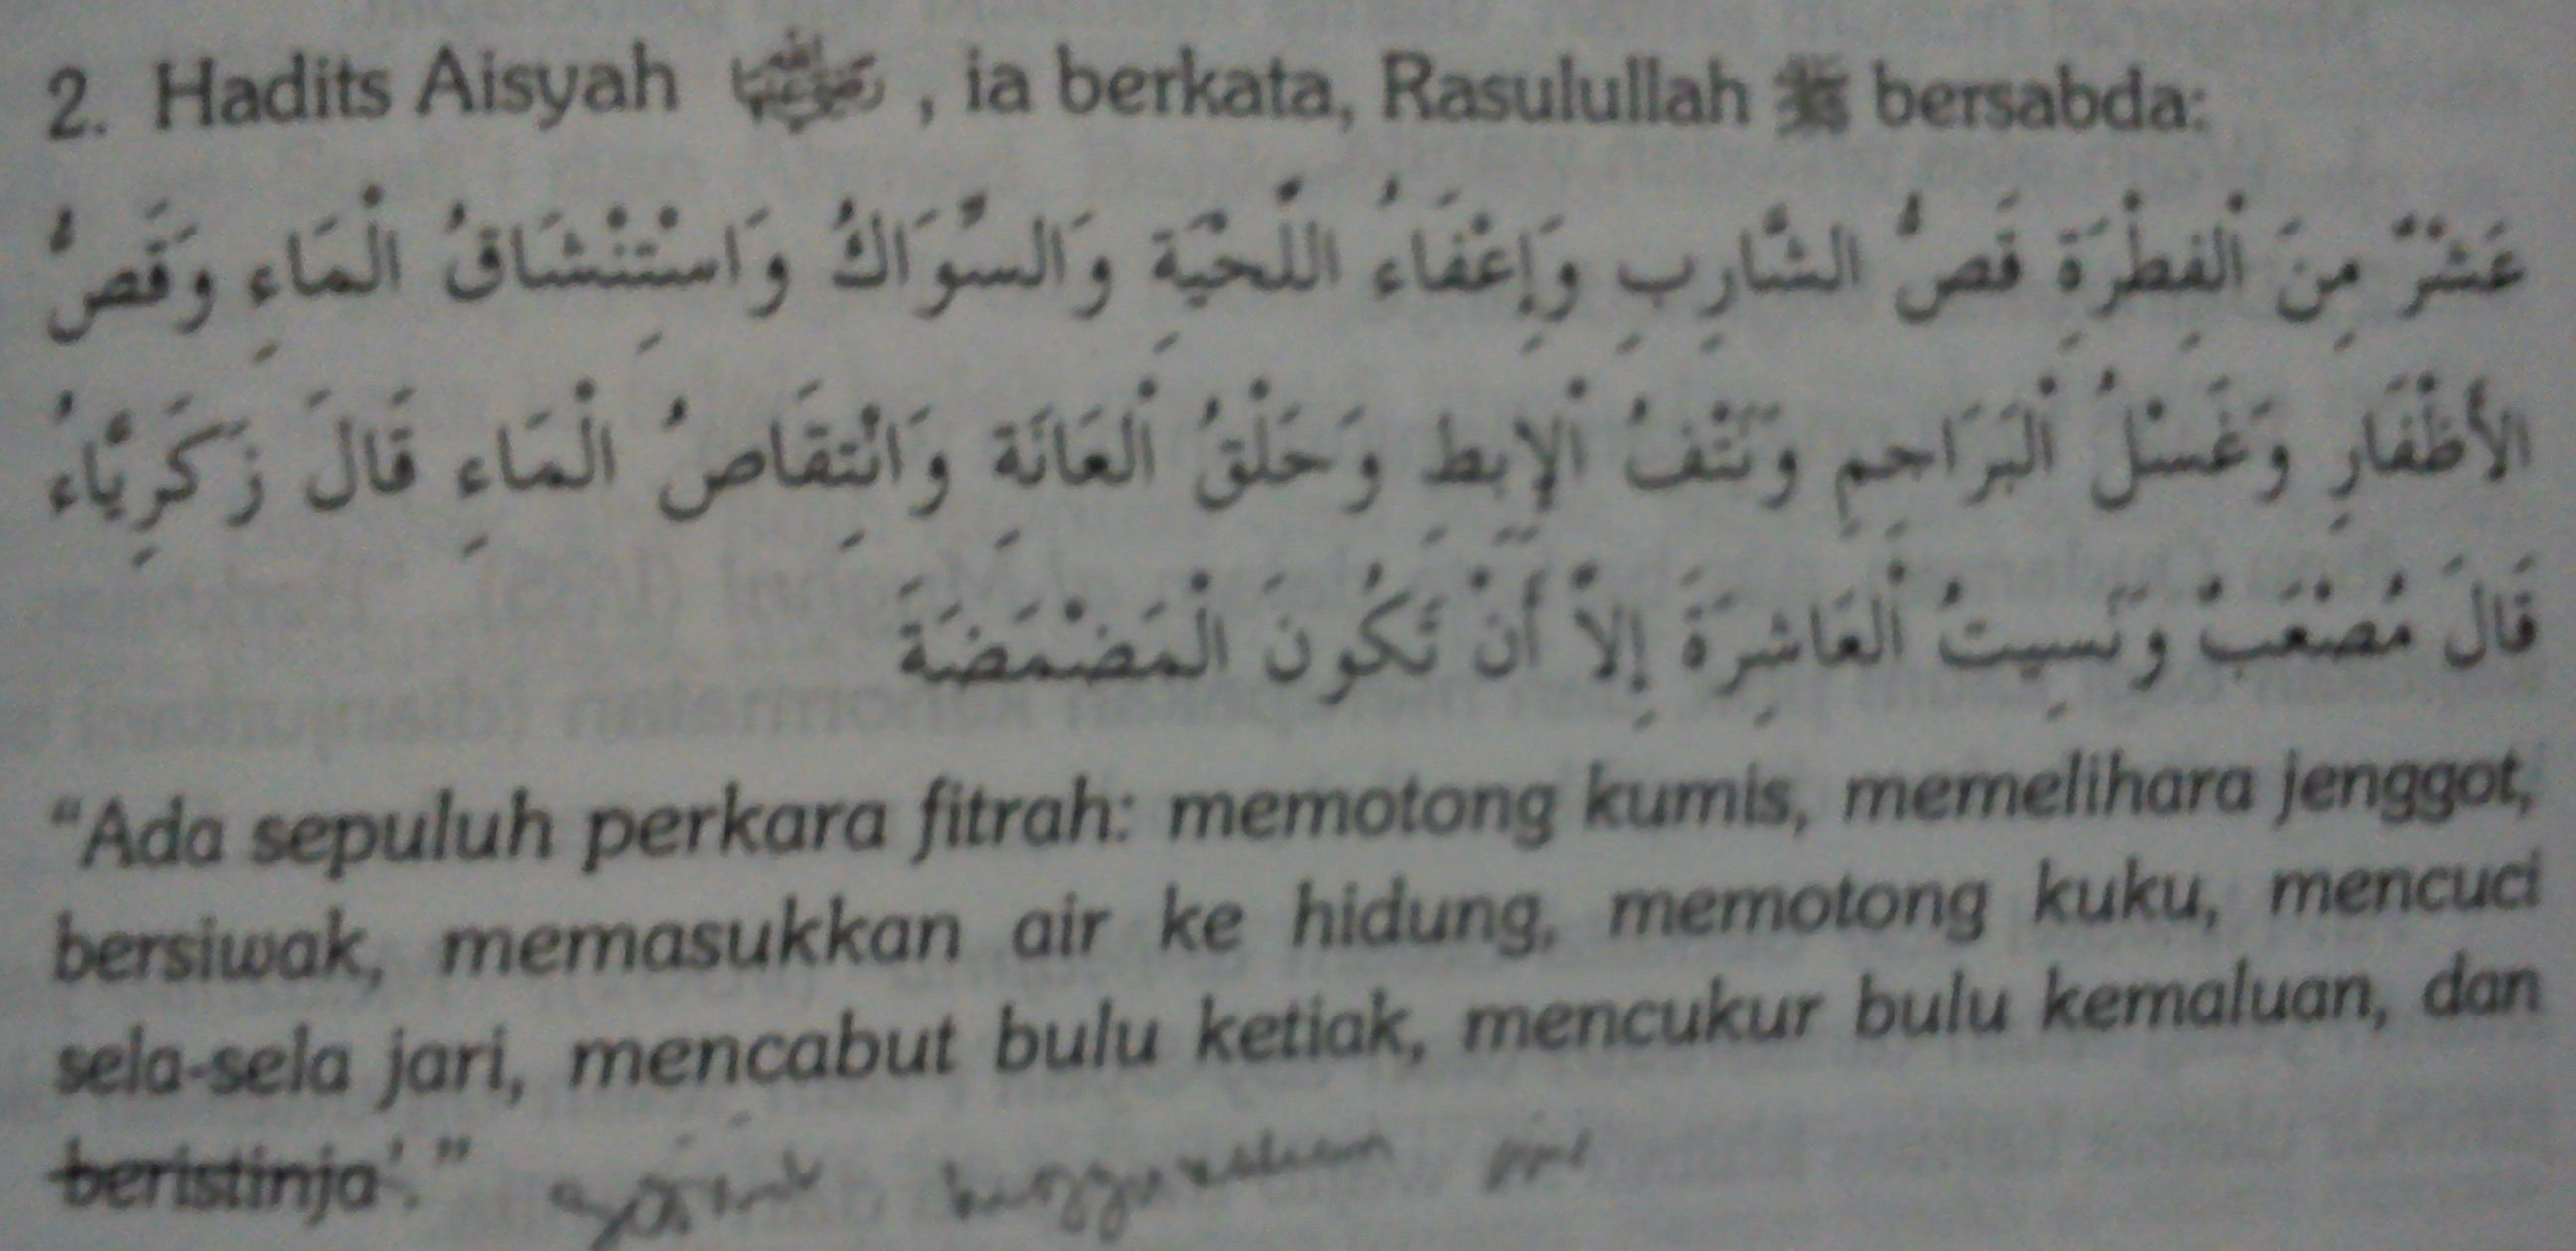 Sunnah-sunnah fithrah 933ae8f6db